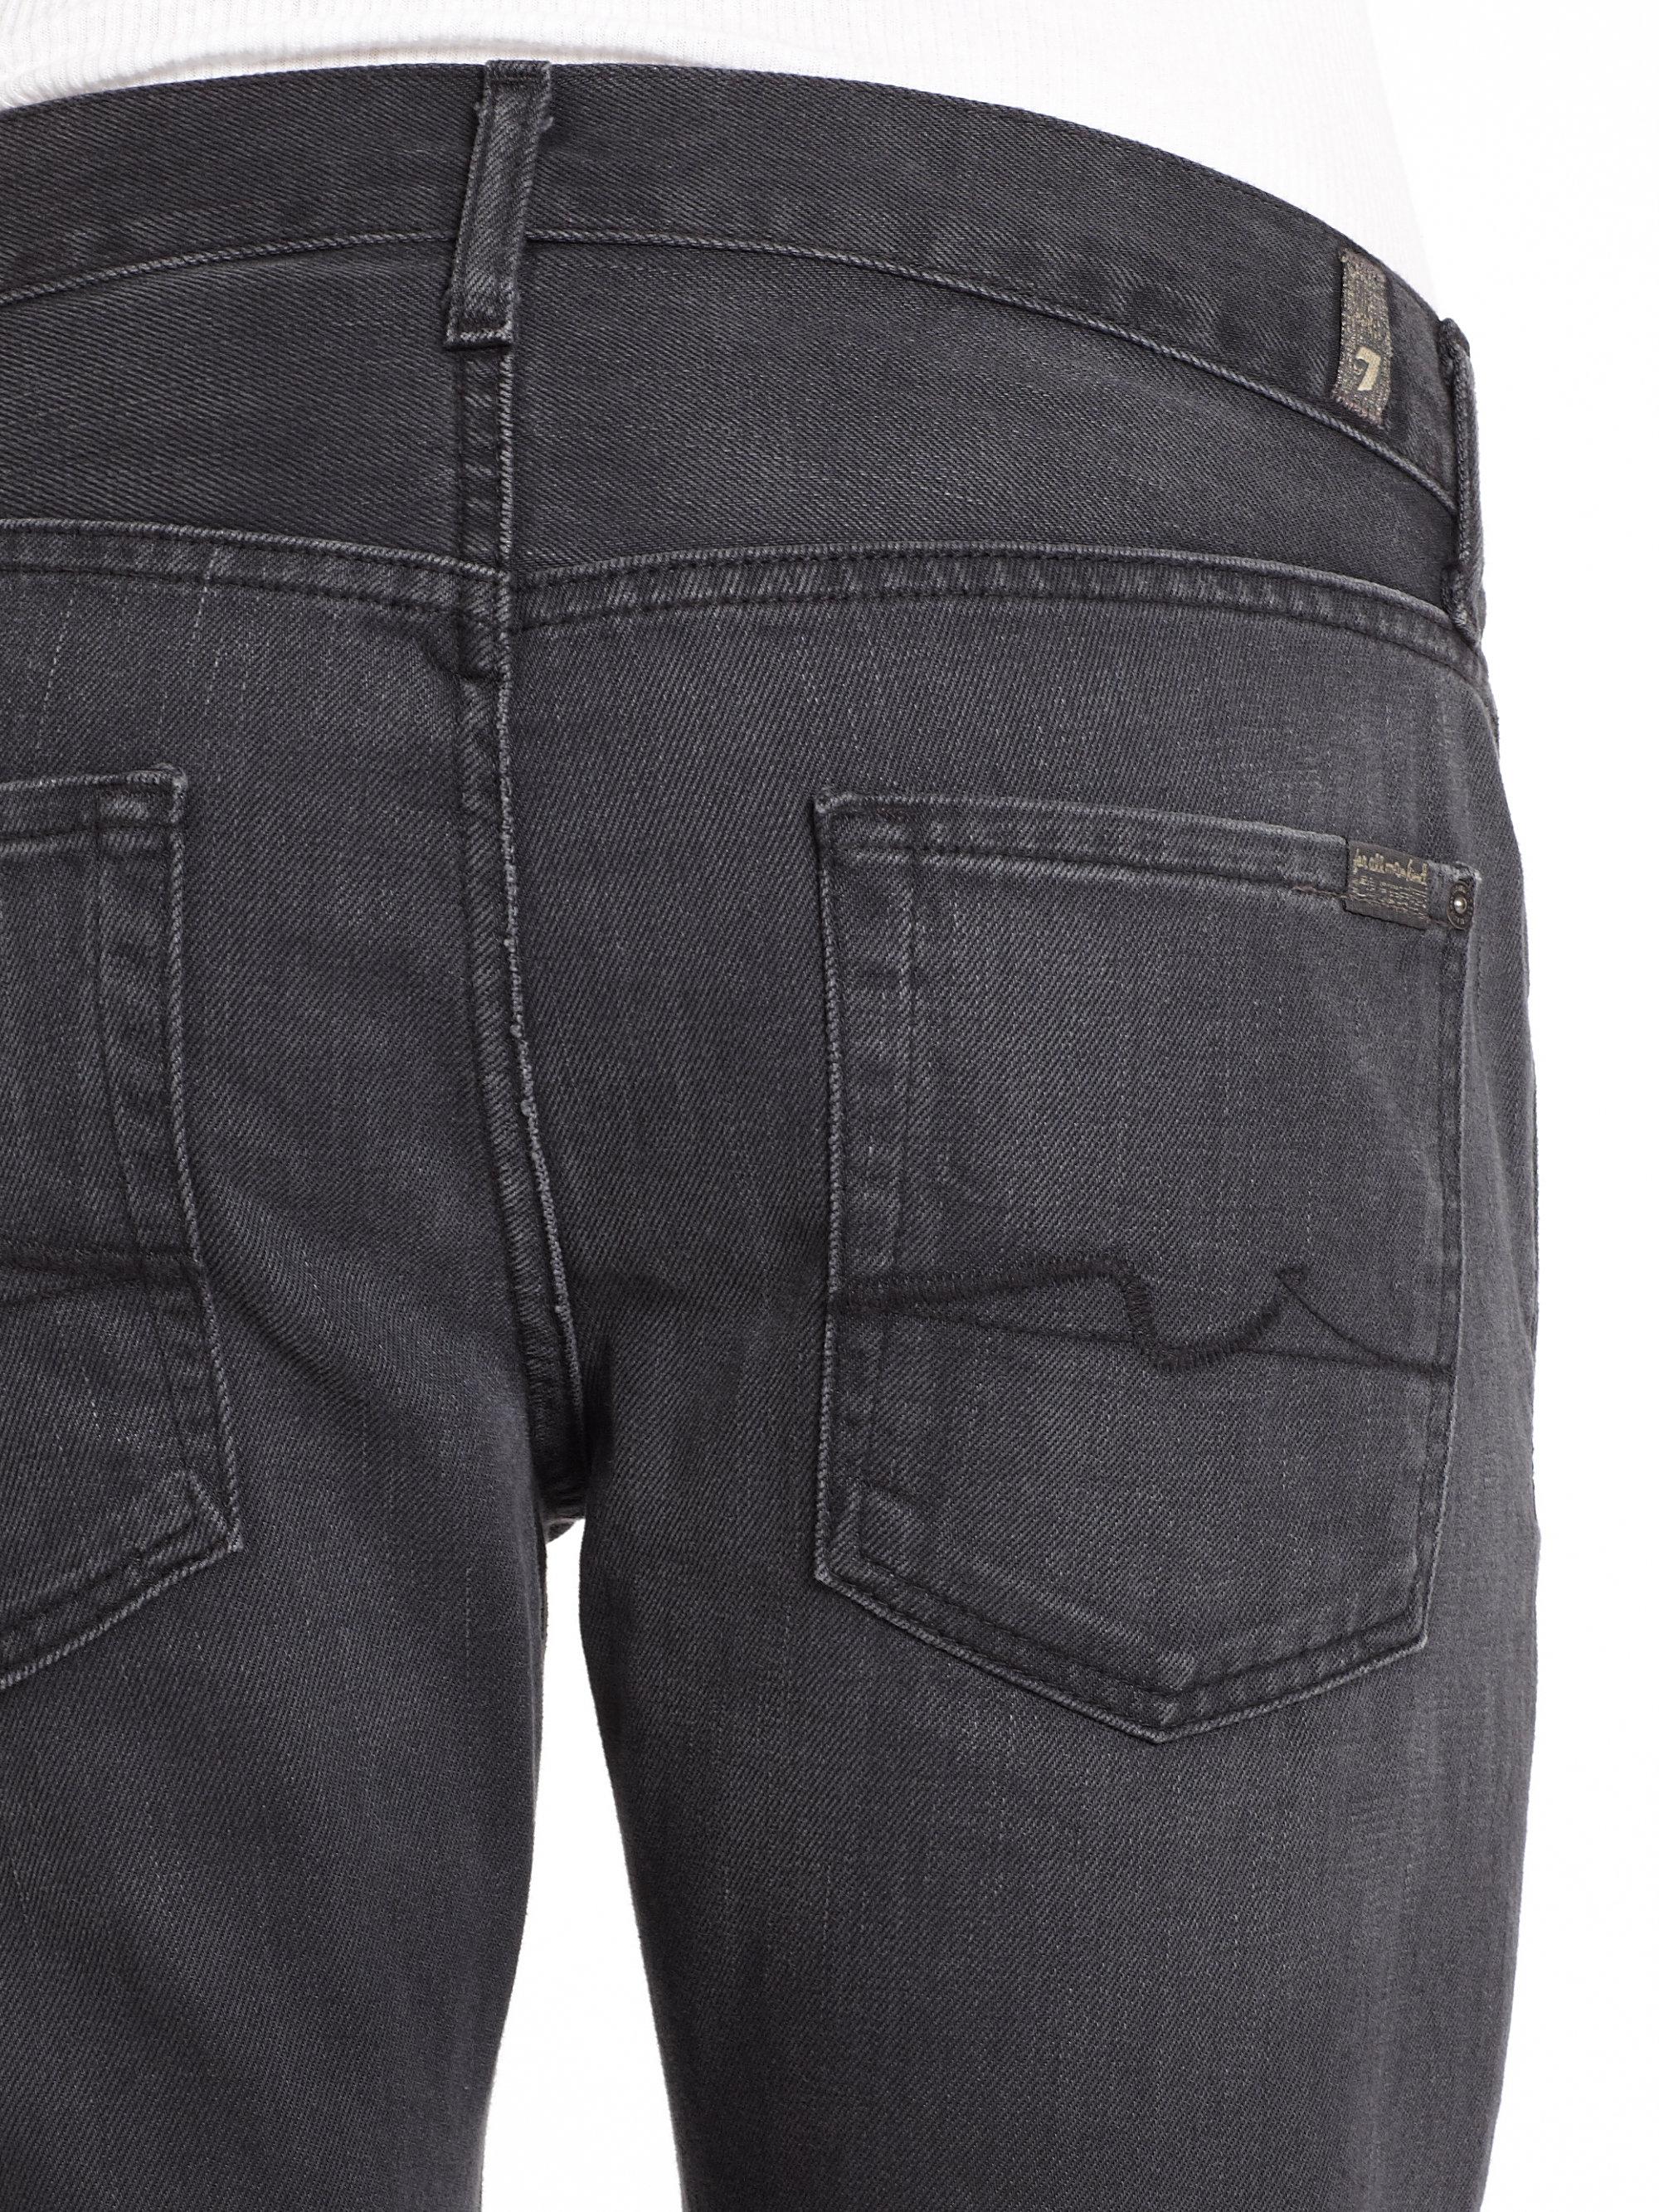 7 for all mankind Carsen Straight Leg Jeans in Gray for Men   Lyst